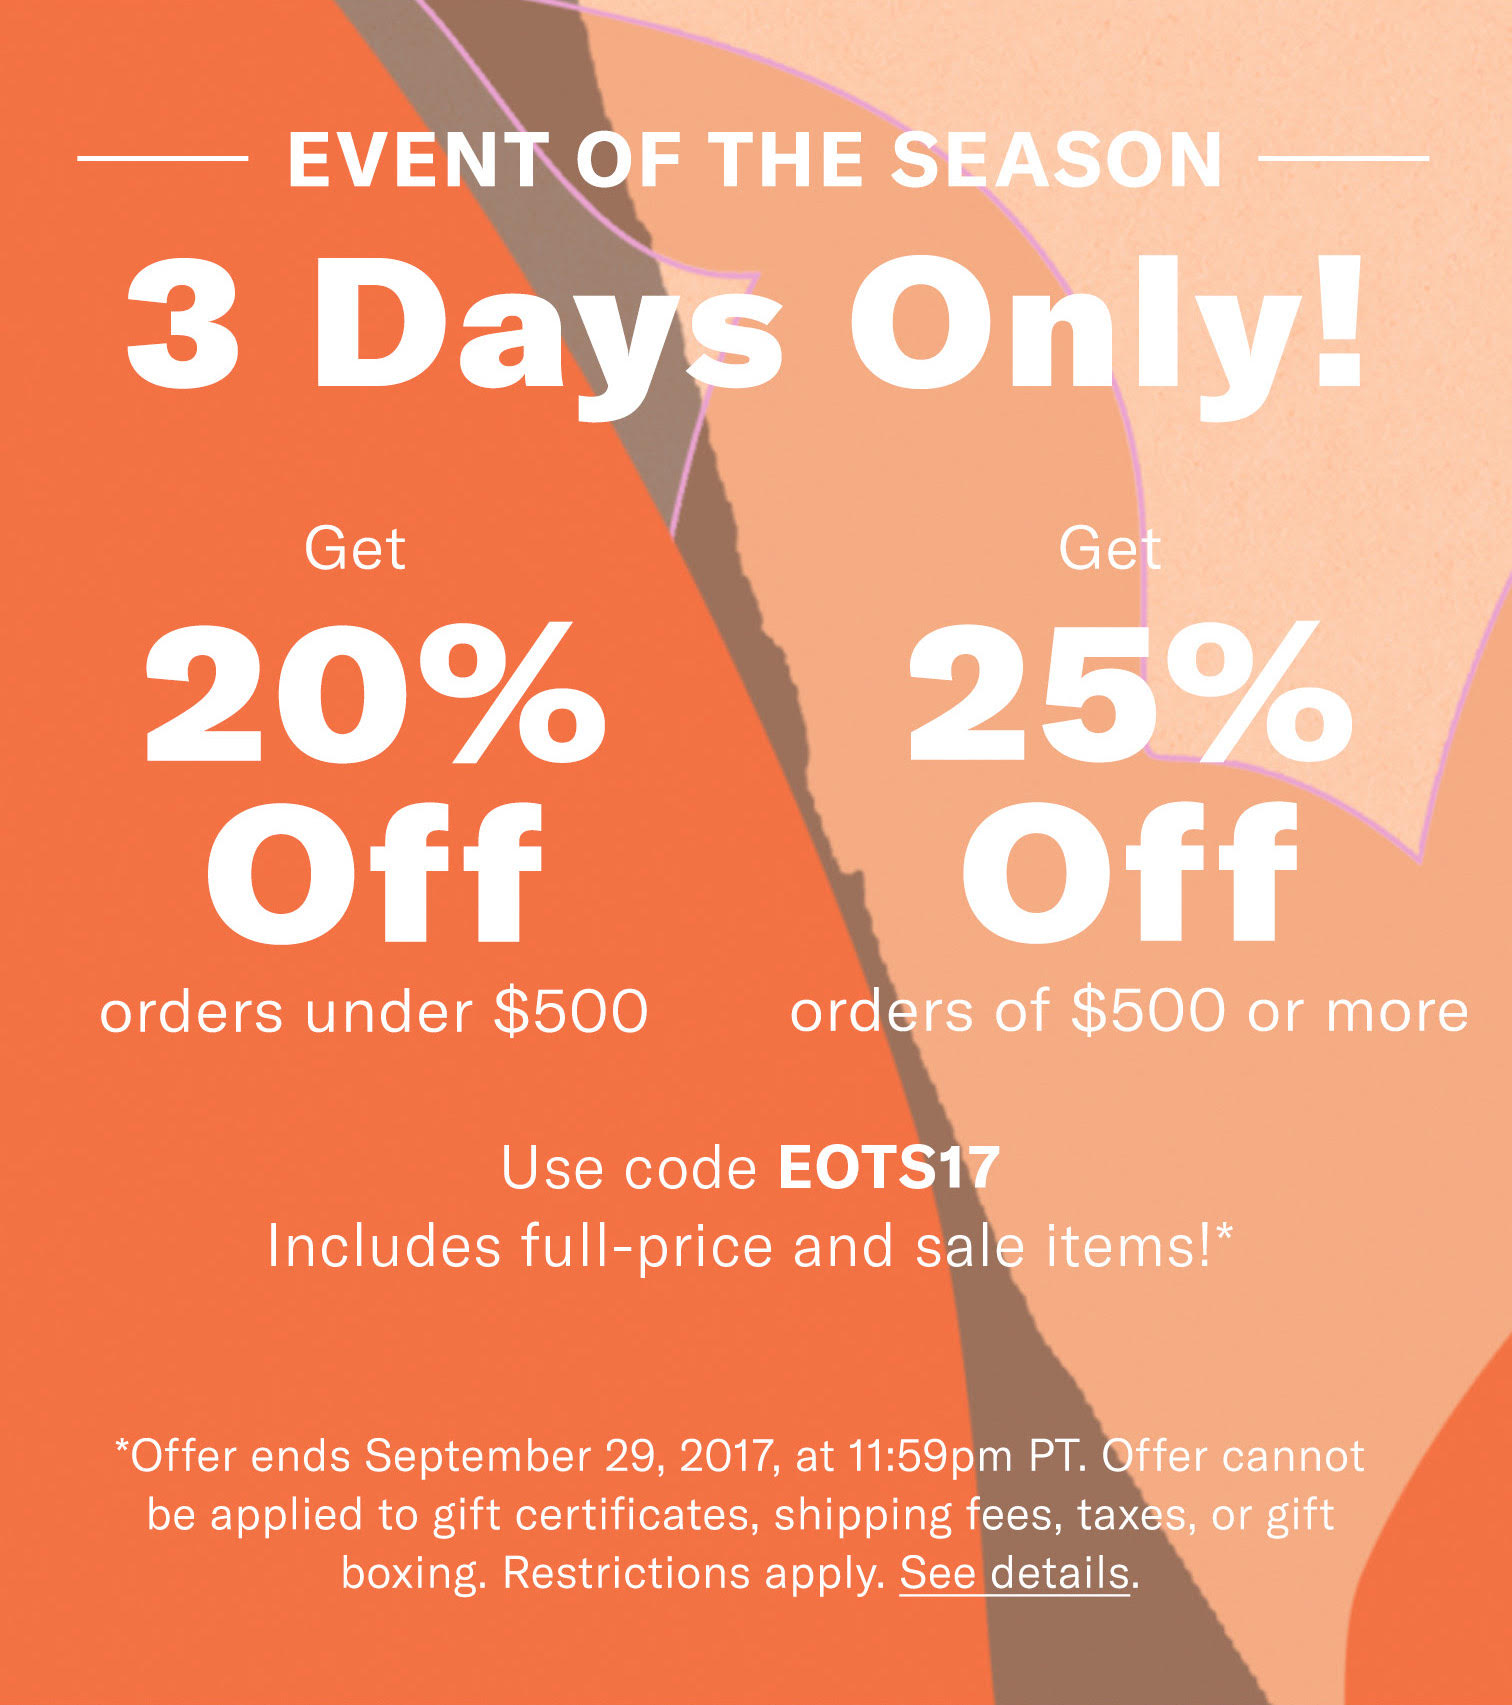 shopbop event of the season